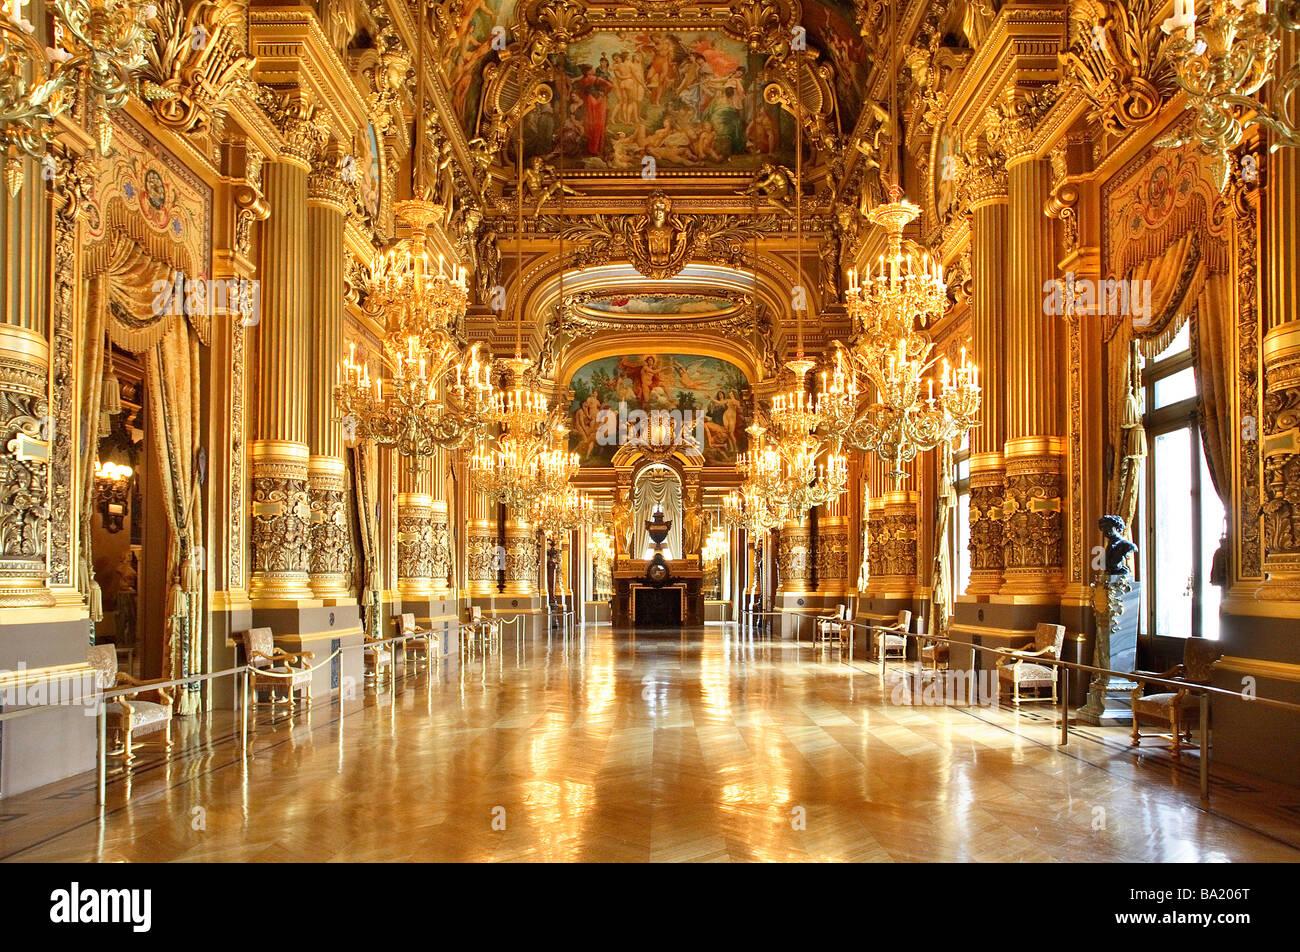 Foyer Grand Rue : Grand foyer opera garnier paris stock photo royalty free